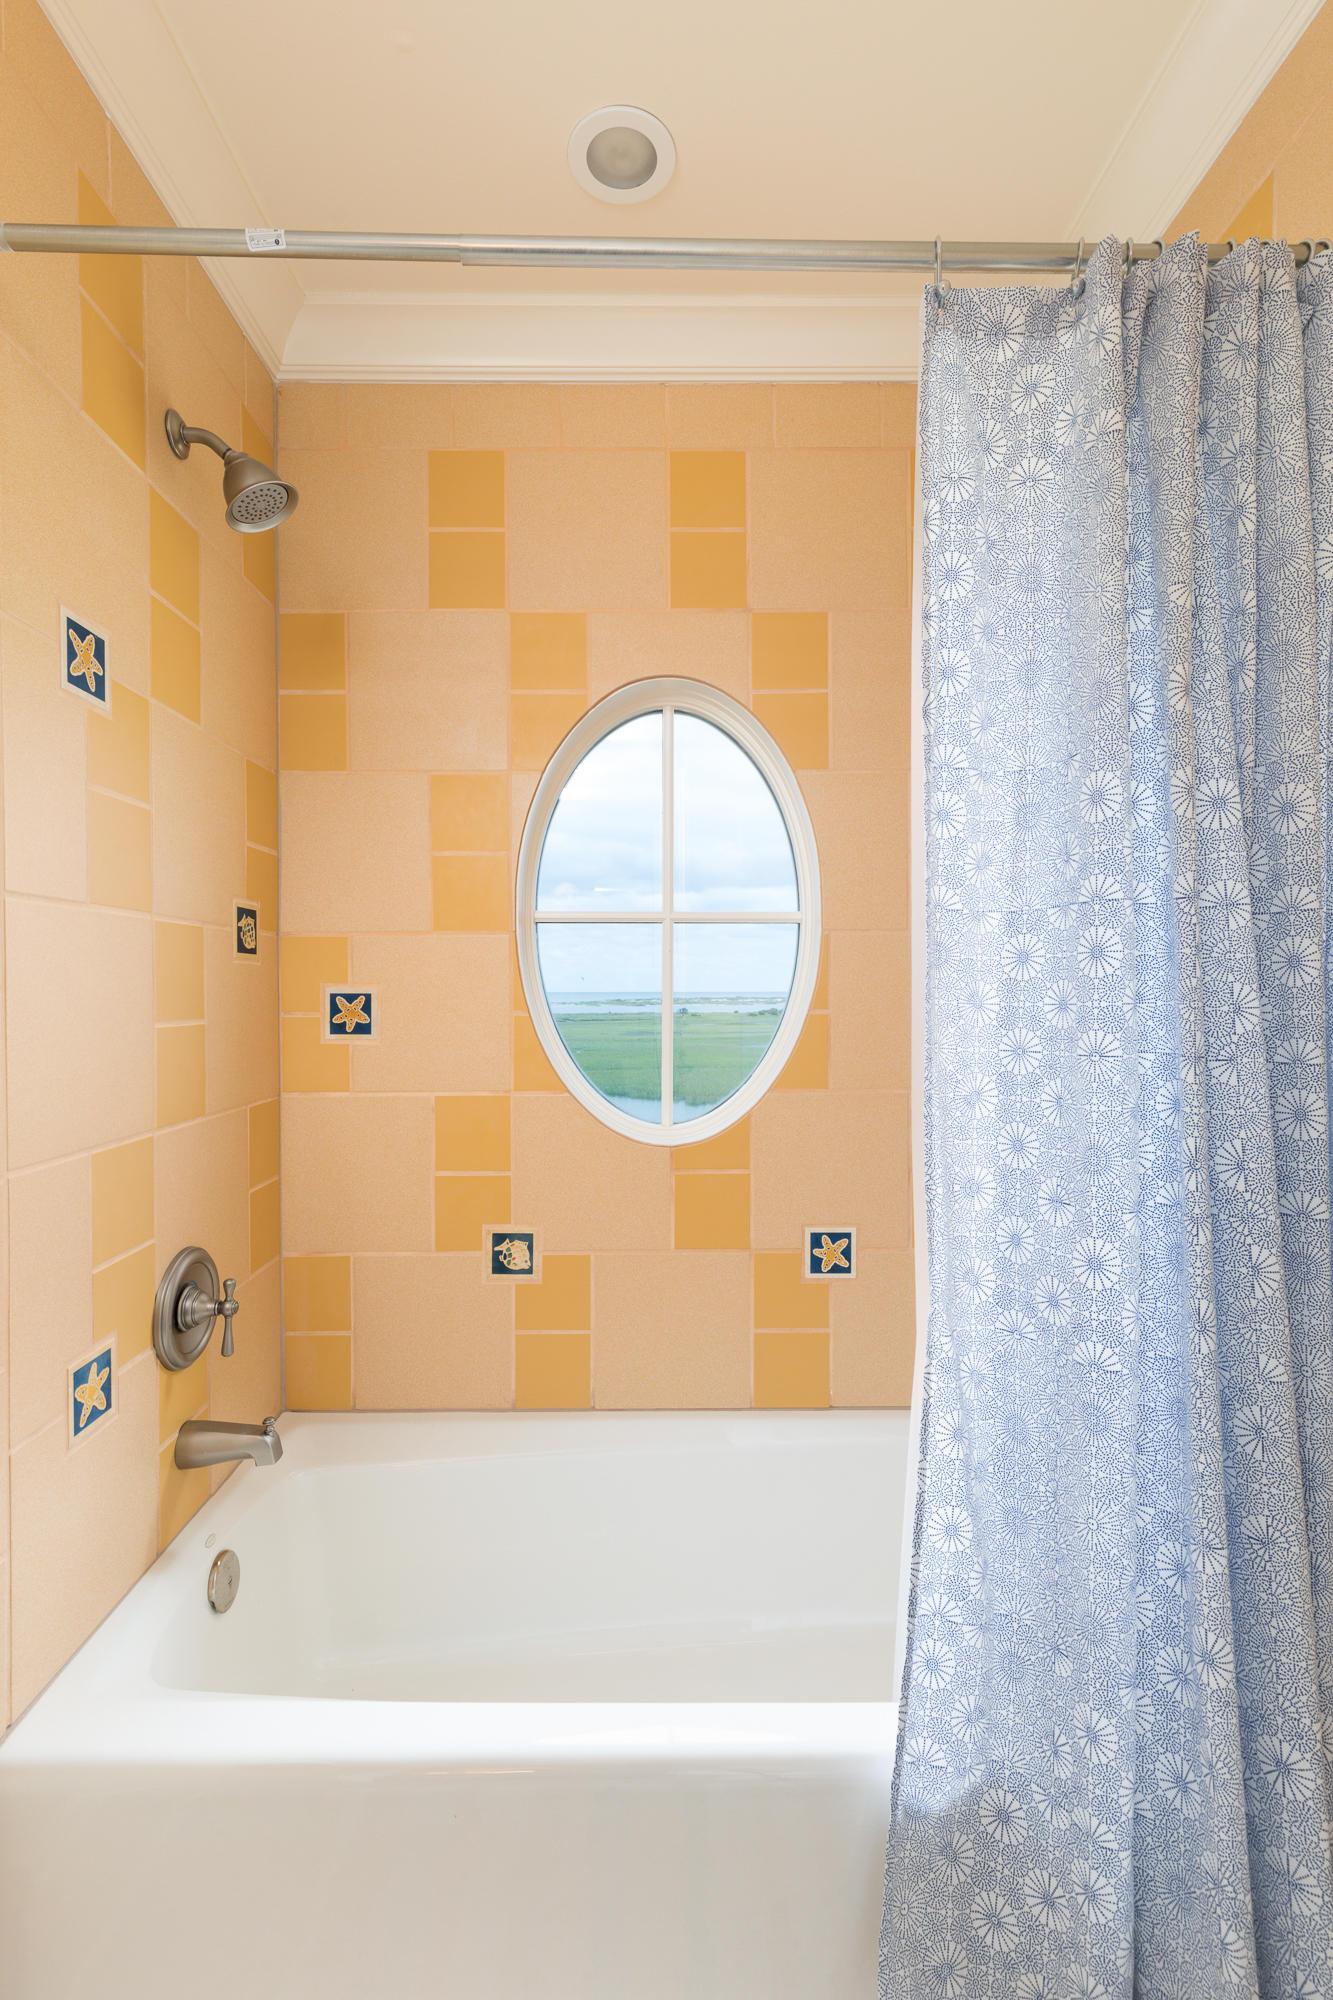 Seabrook Island Homes For Sale - 3033 Marshgate, Johns Island, SC - 0